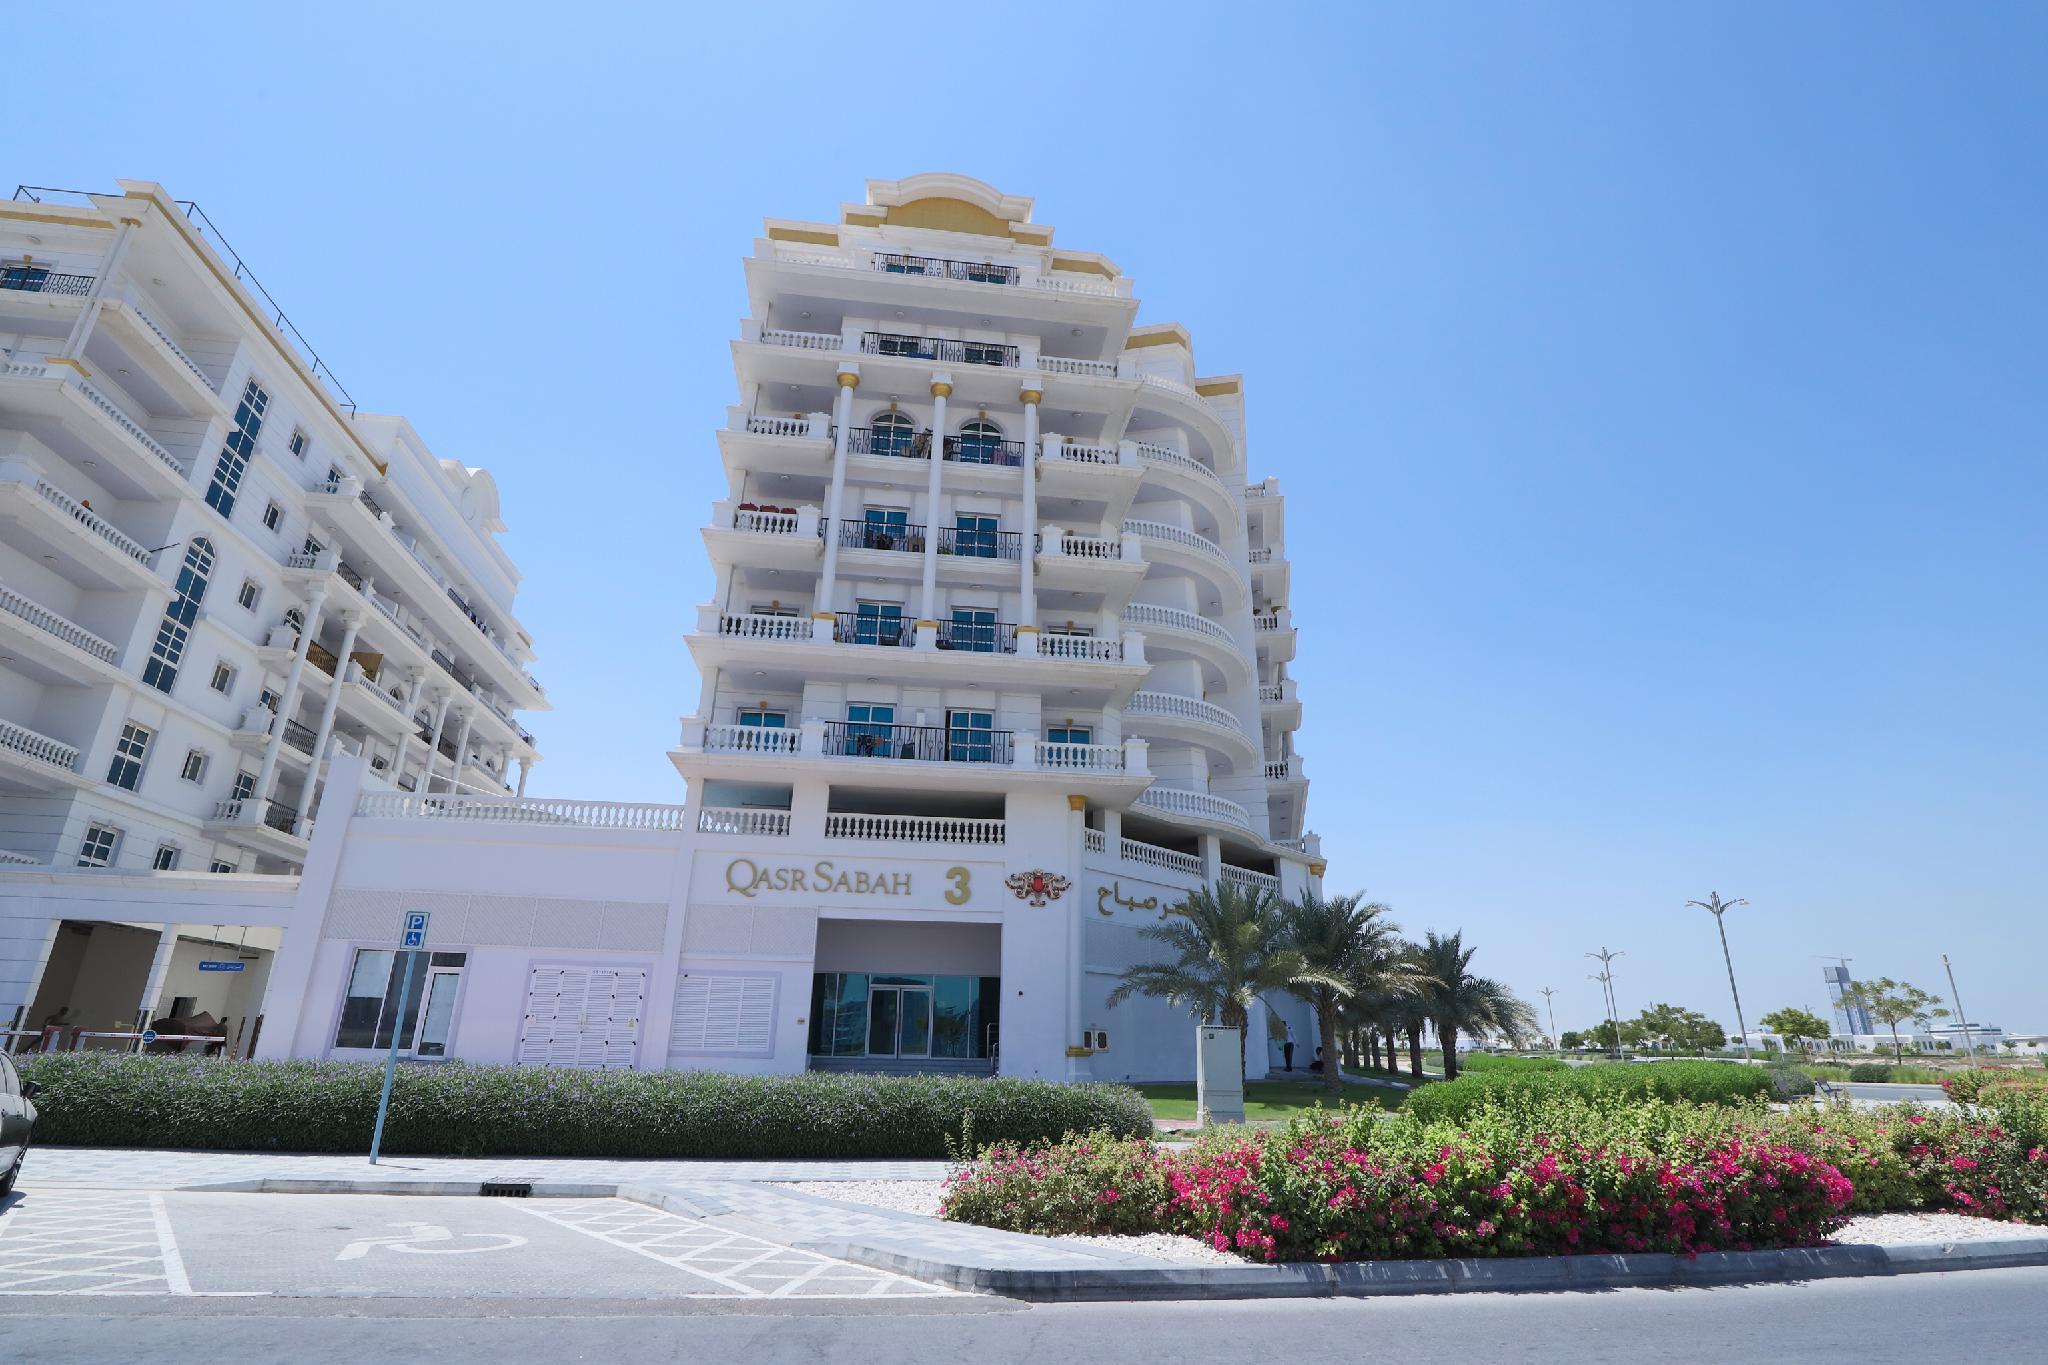 OYO Home 372 1BHK Qasr Sabah 3 IMPZ